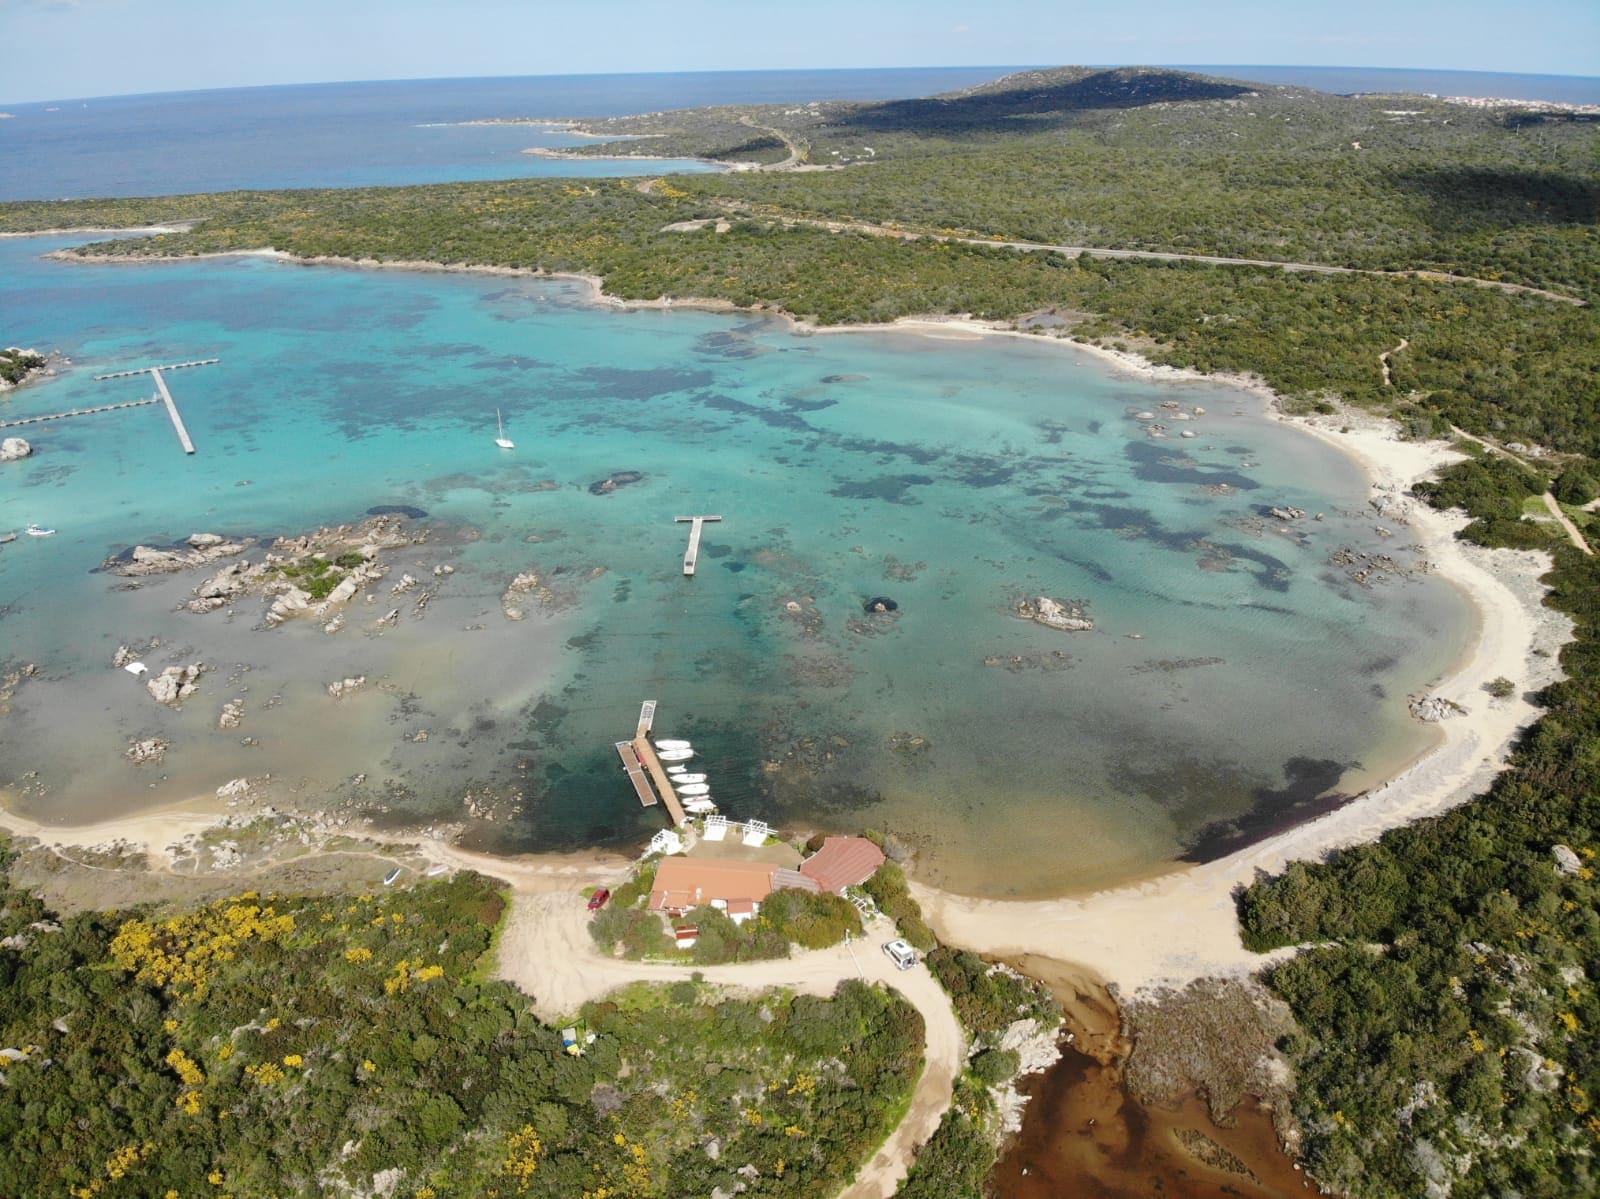 Sardinië snorkelparadijs voor camperaars in Europa